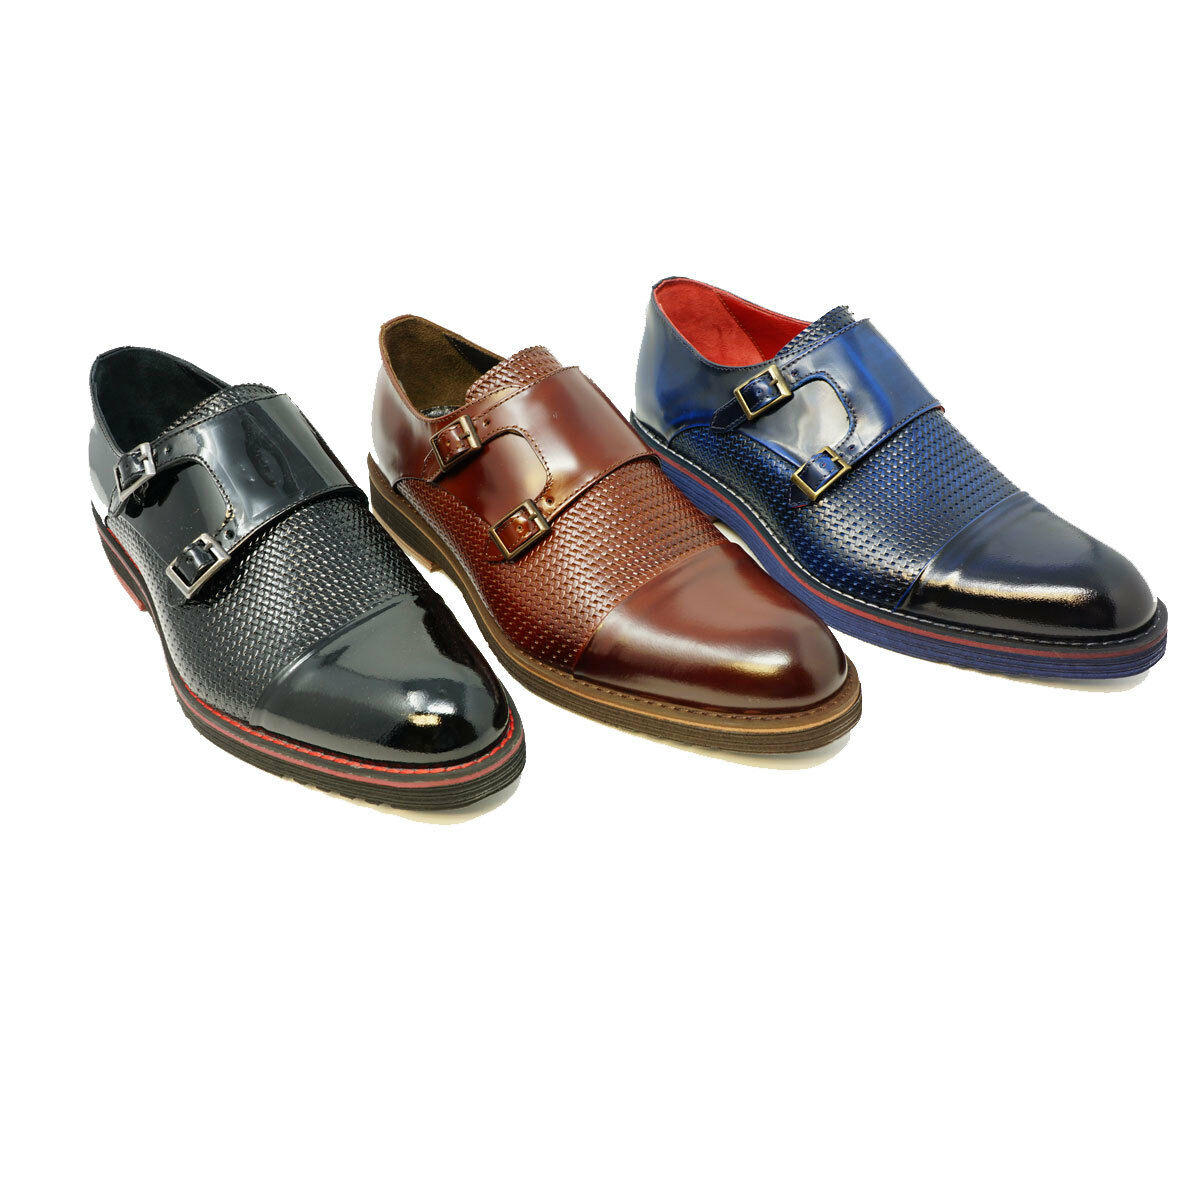 negozio d'offerta Futoli Uomo 100% Genuine Genuine Genuine Leather Double Monk Fahsion Dress scarpe Handmade  popolare